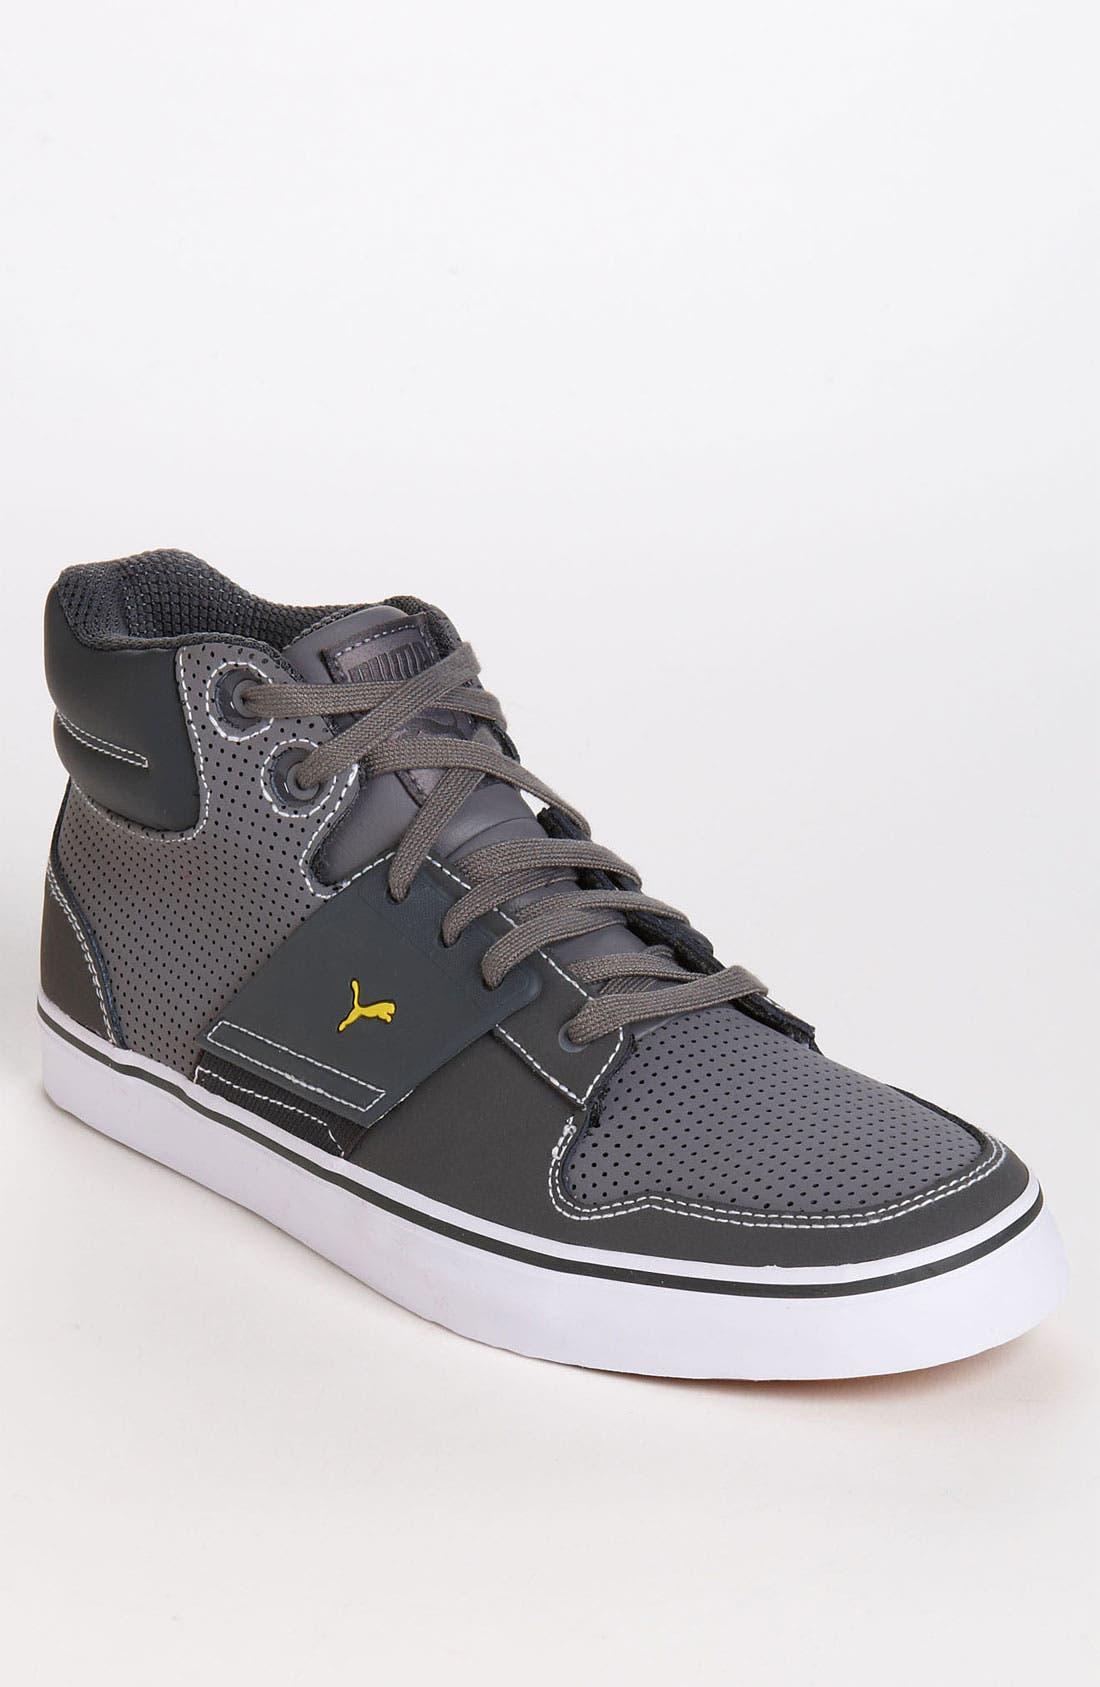 Main Image - PUMA 'El Ace 2 Mid' Sneaker (Men)